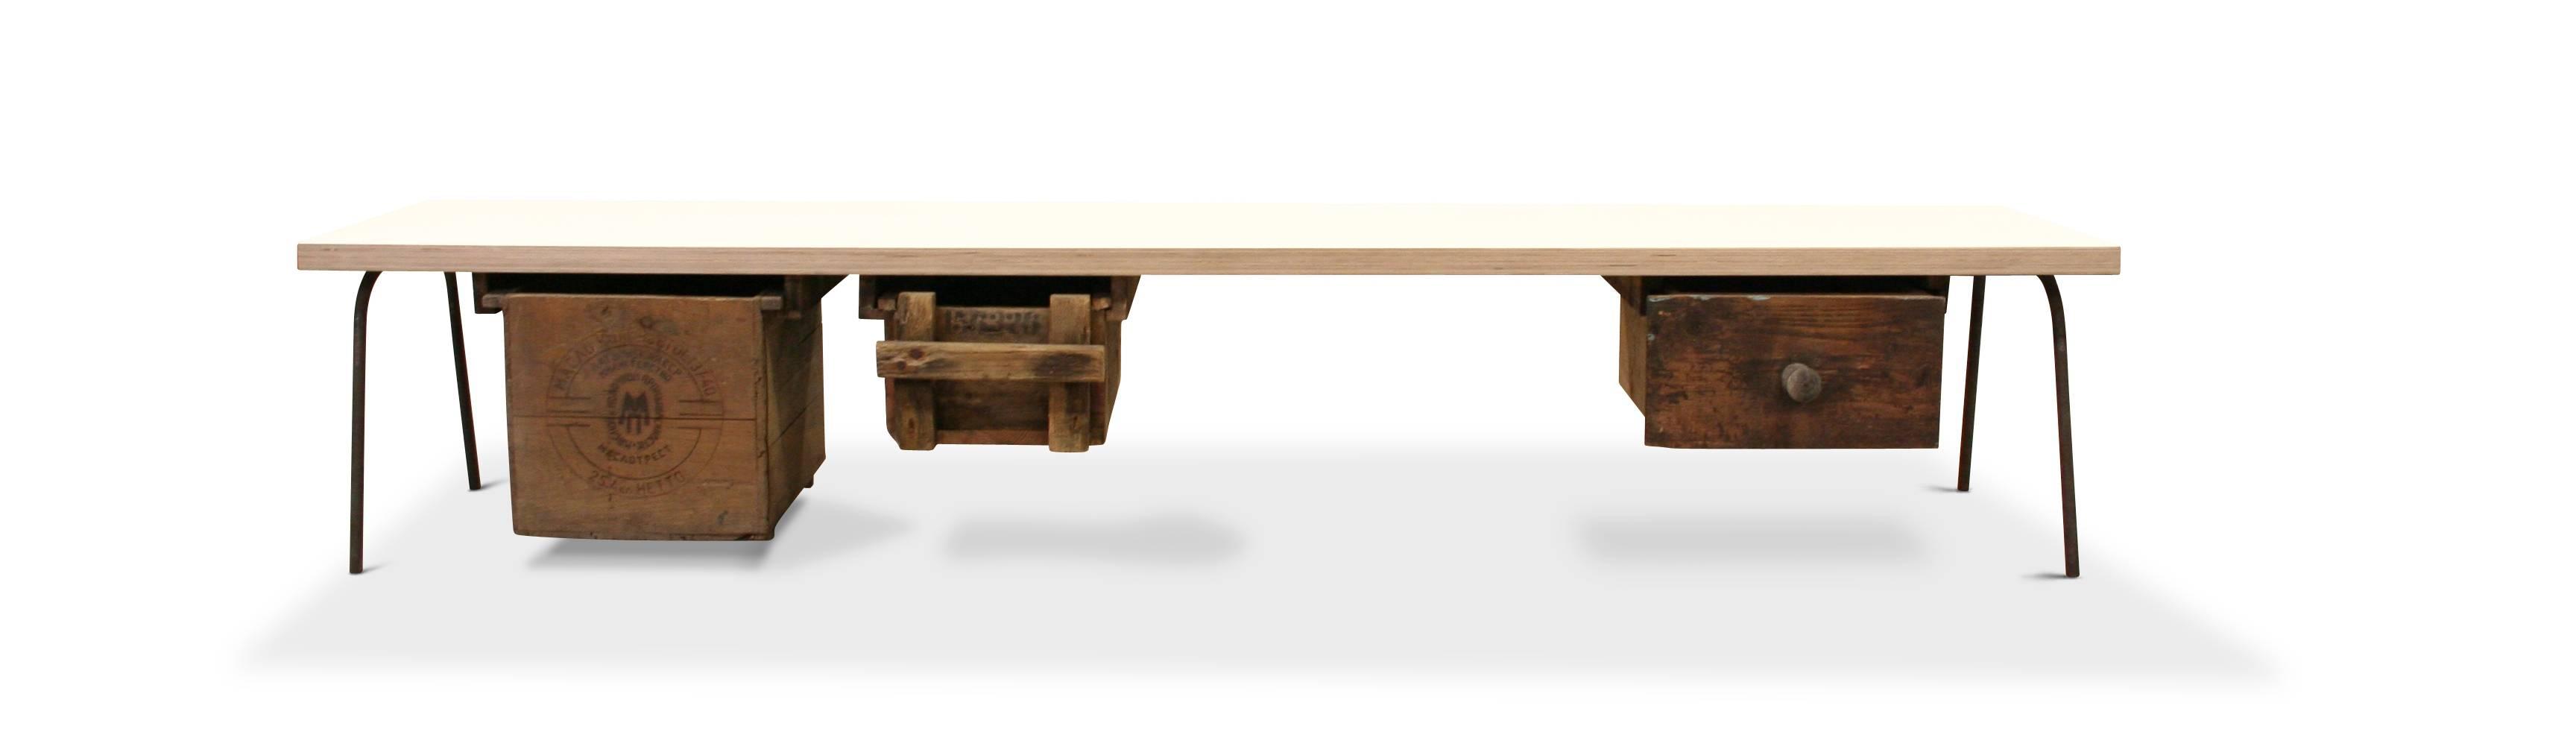 neuformat möbeldesign